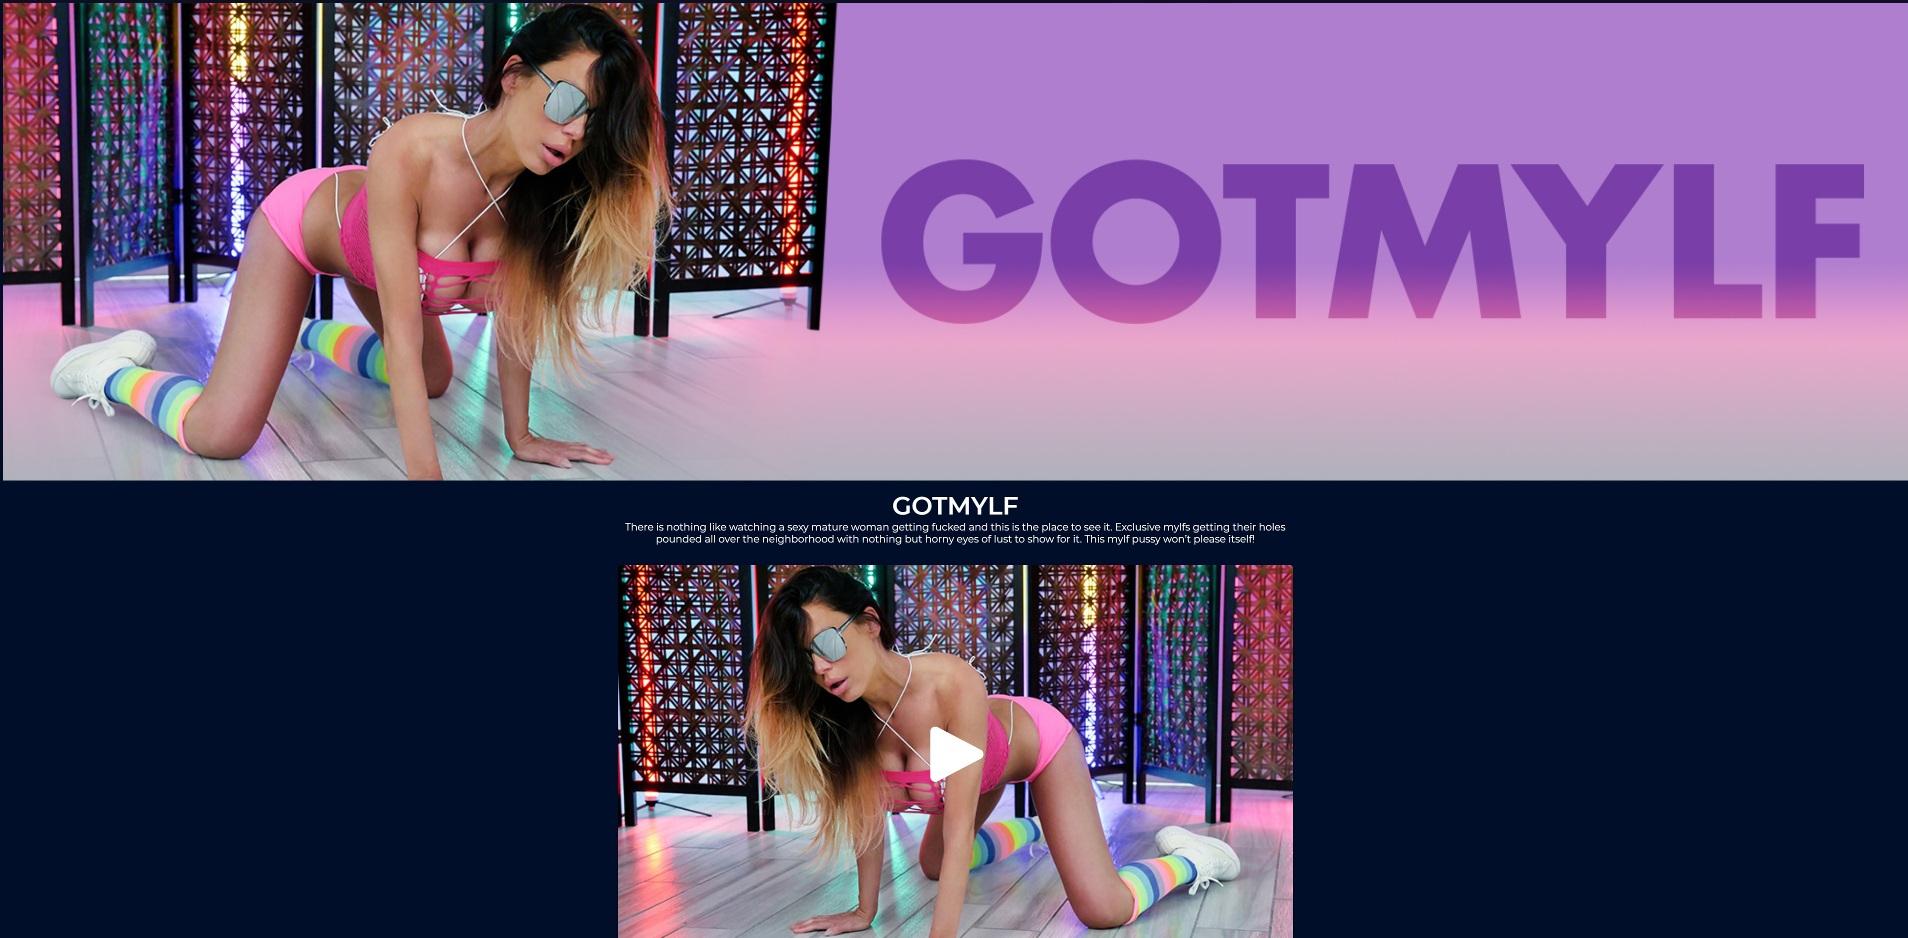 GotMYLF.com - Full SiteRip!